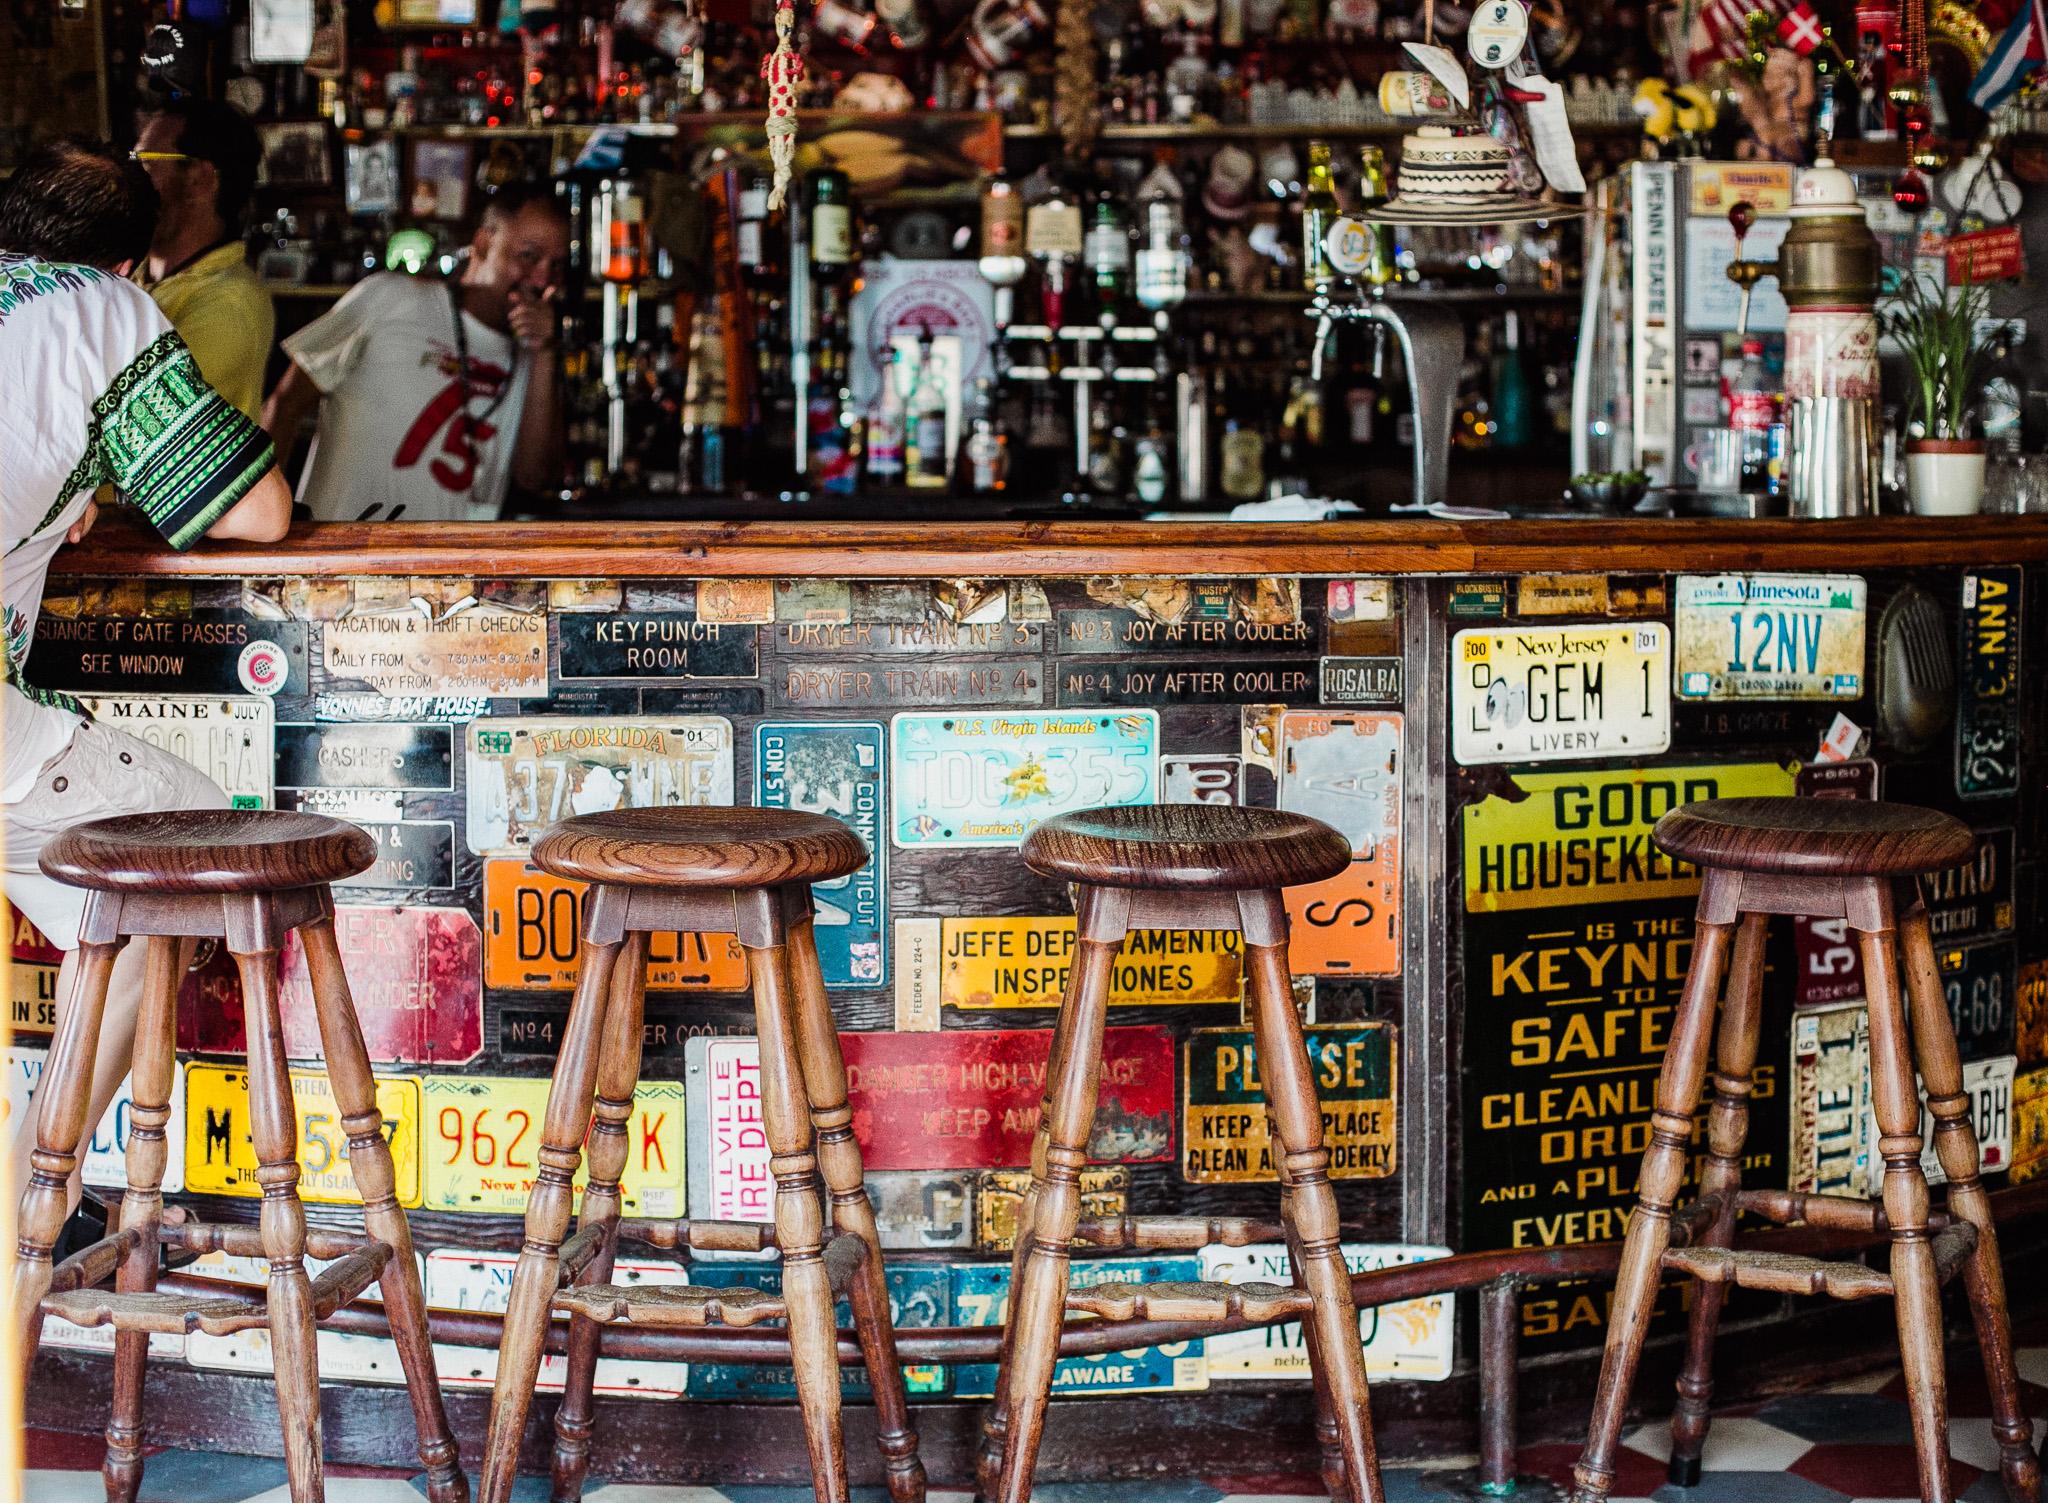 Charlies Bar San Nicolas - Aruba   Our waiter gives us a quick wink and a,  see ya later